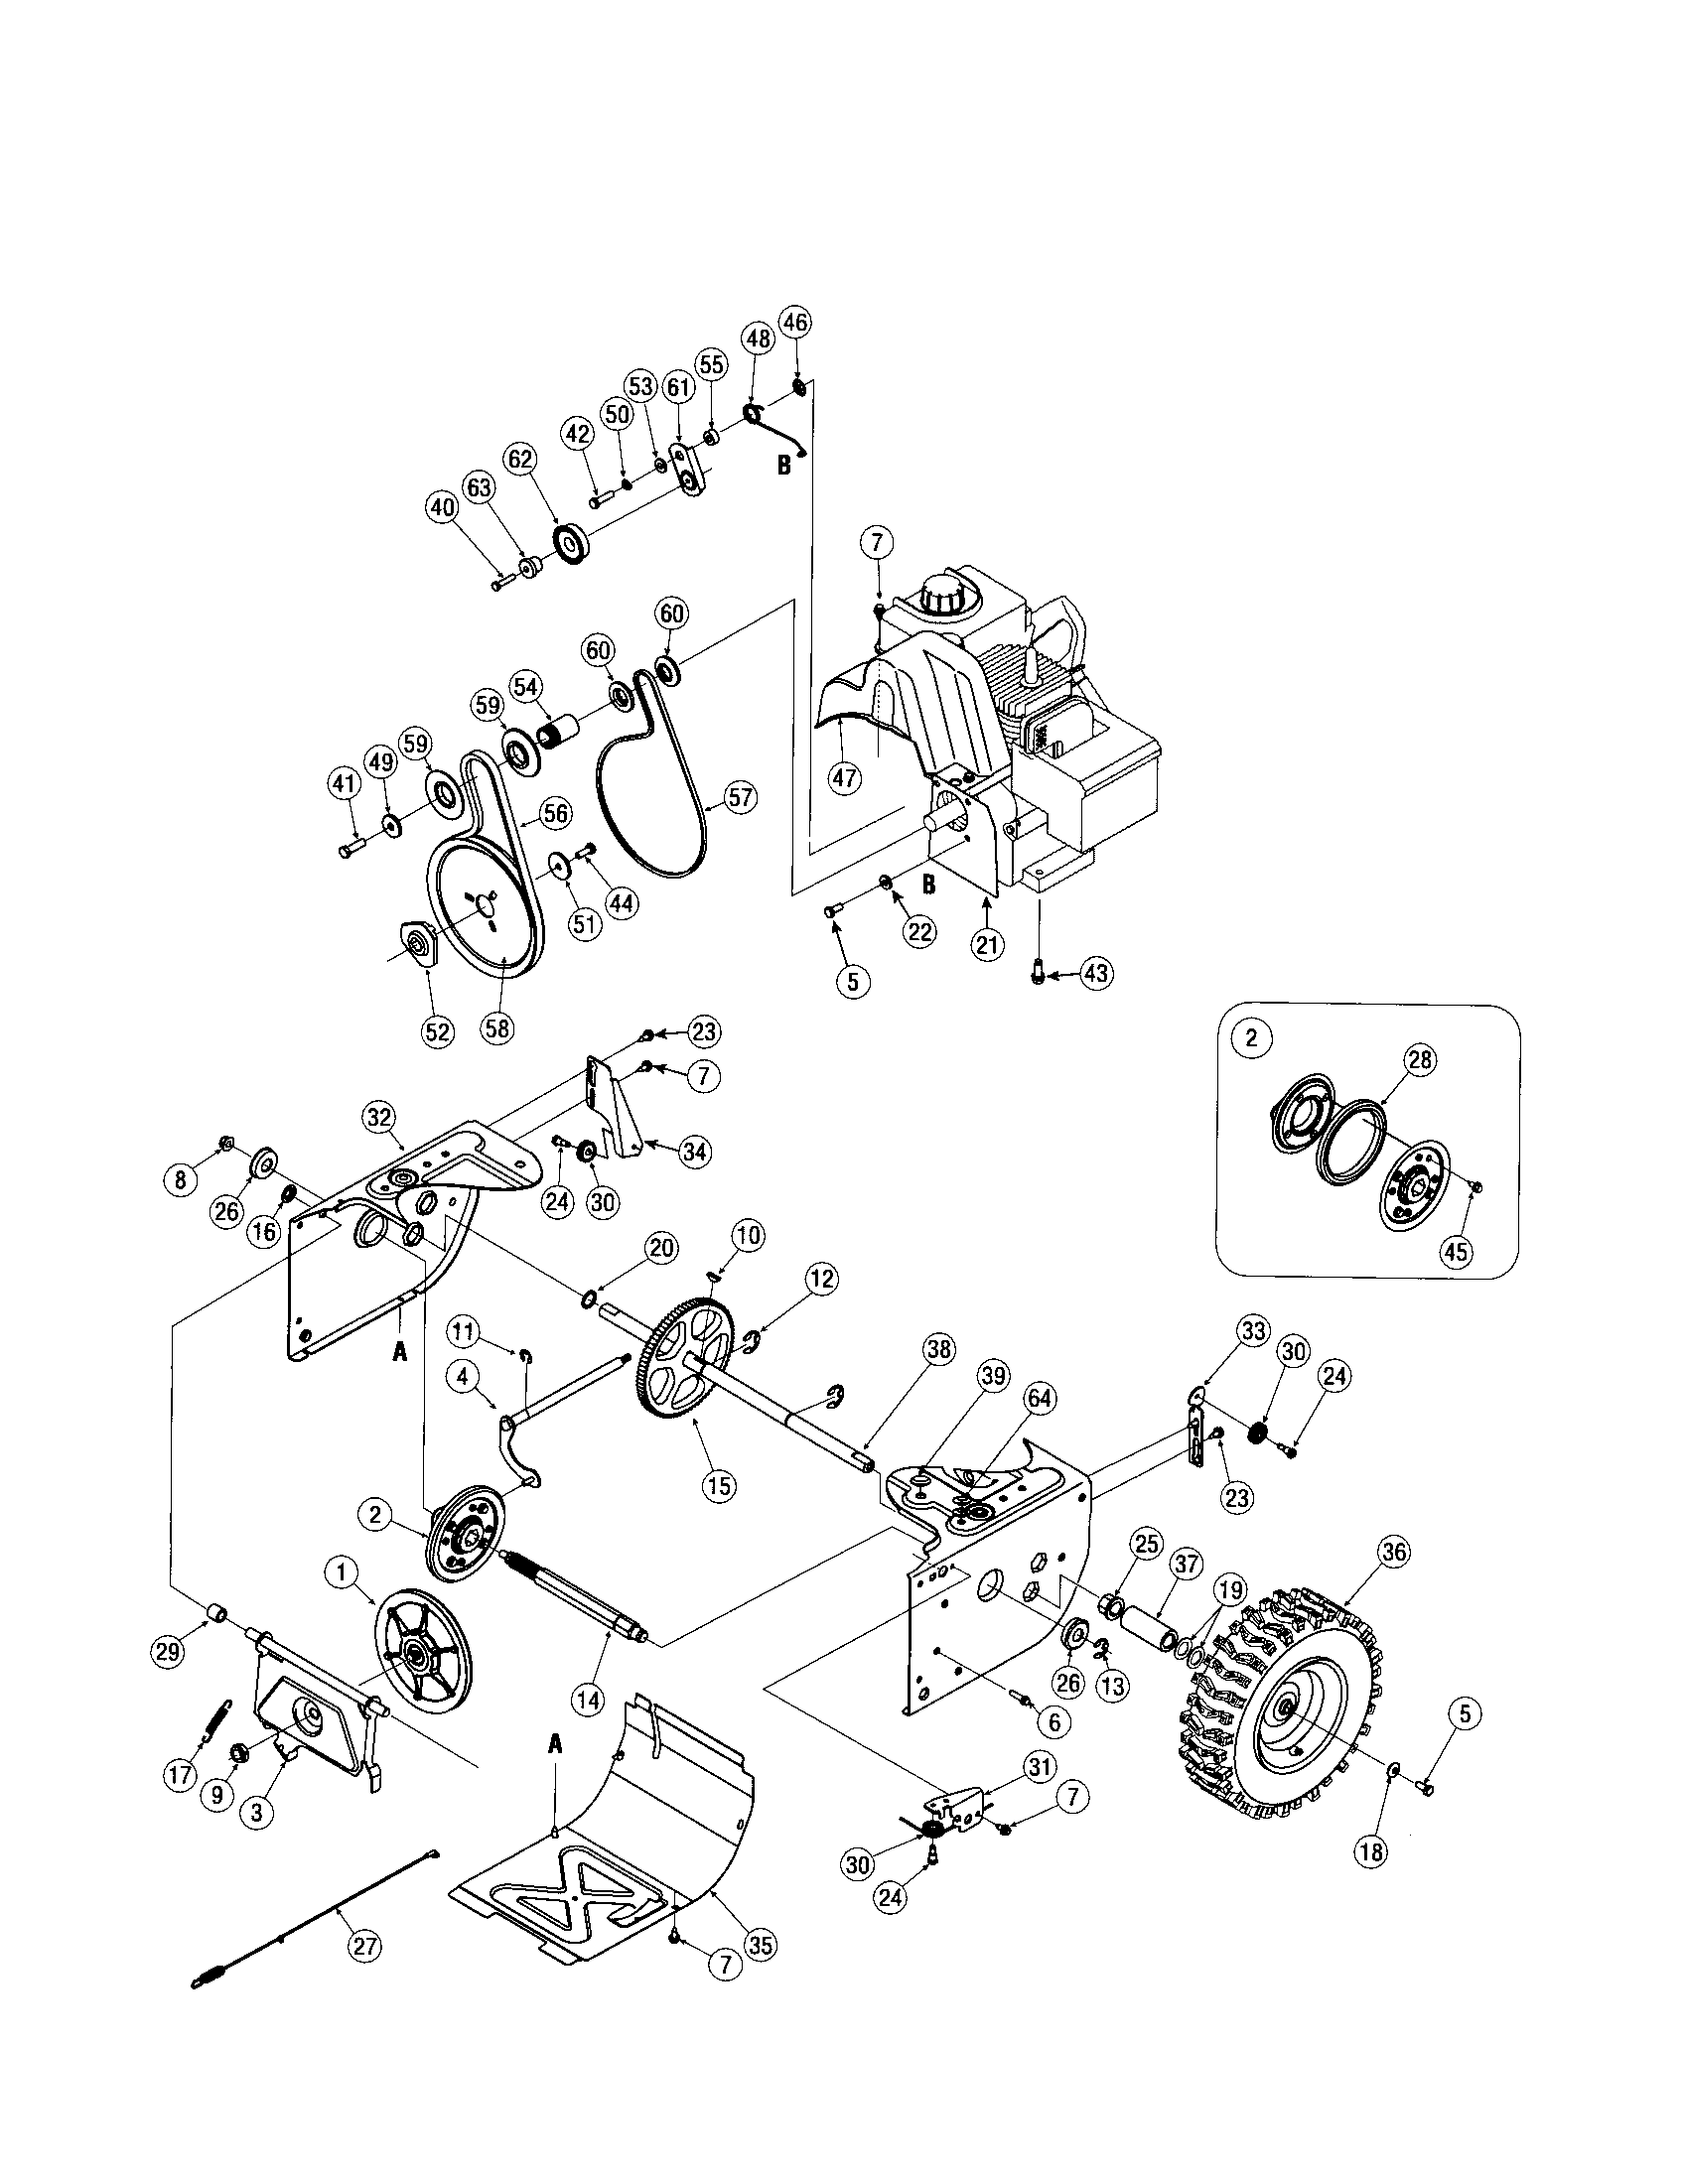 Craftsman model 247883550 snowthrower, gas genuine parts